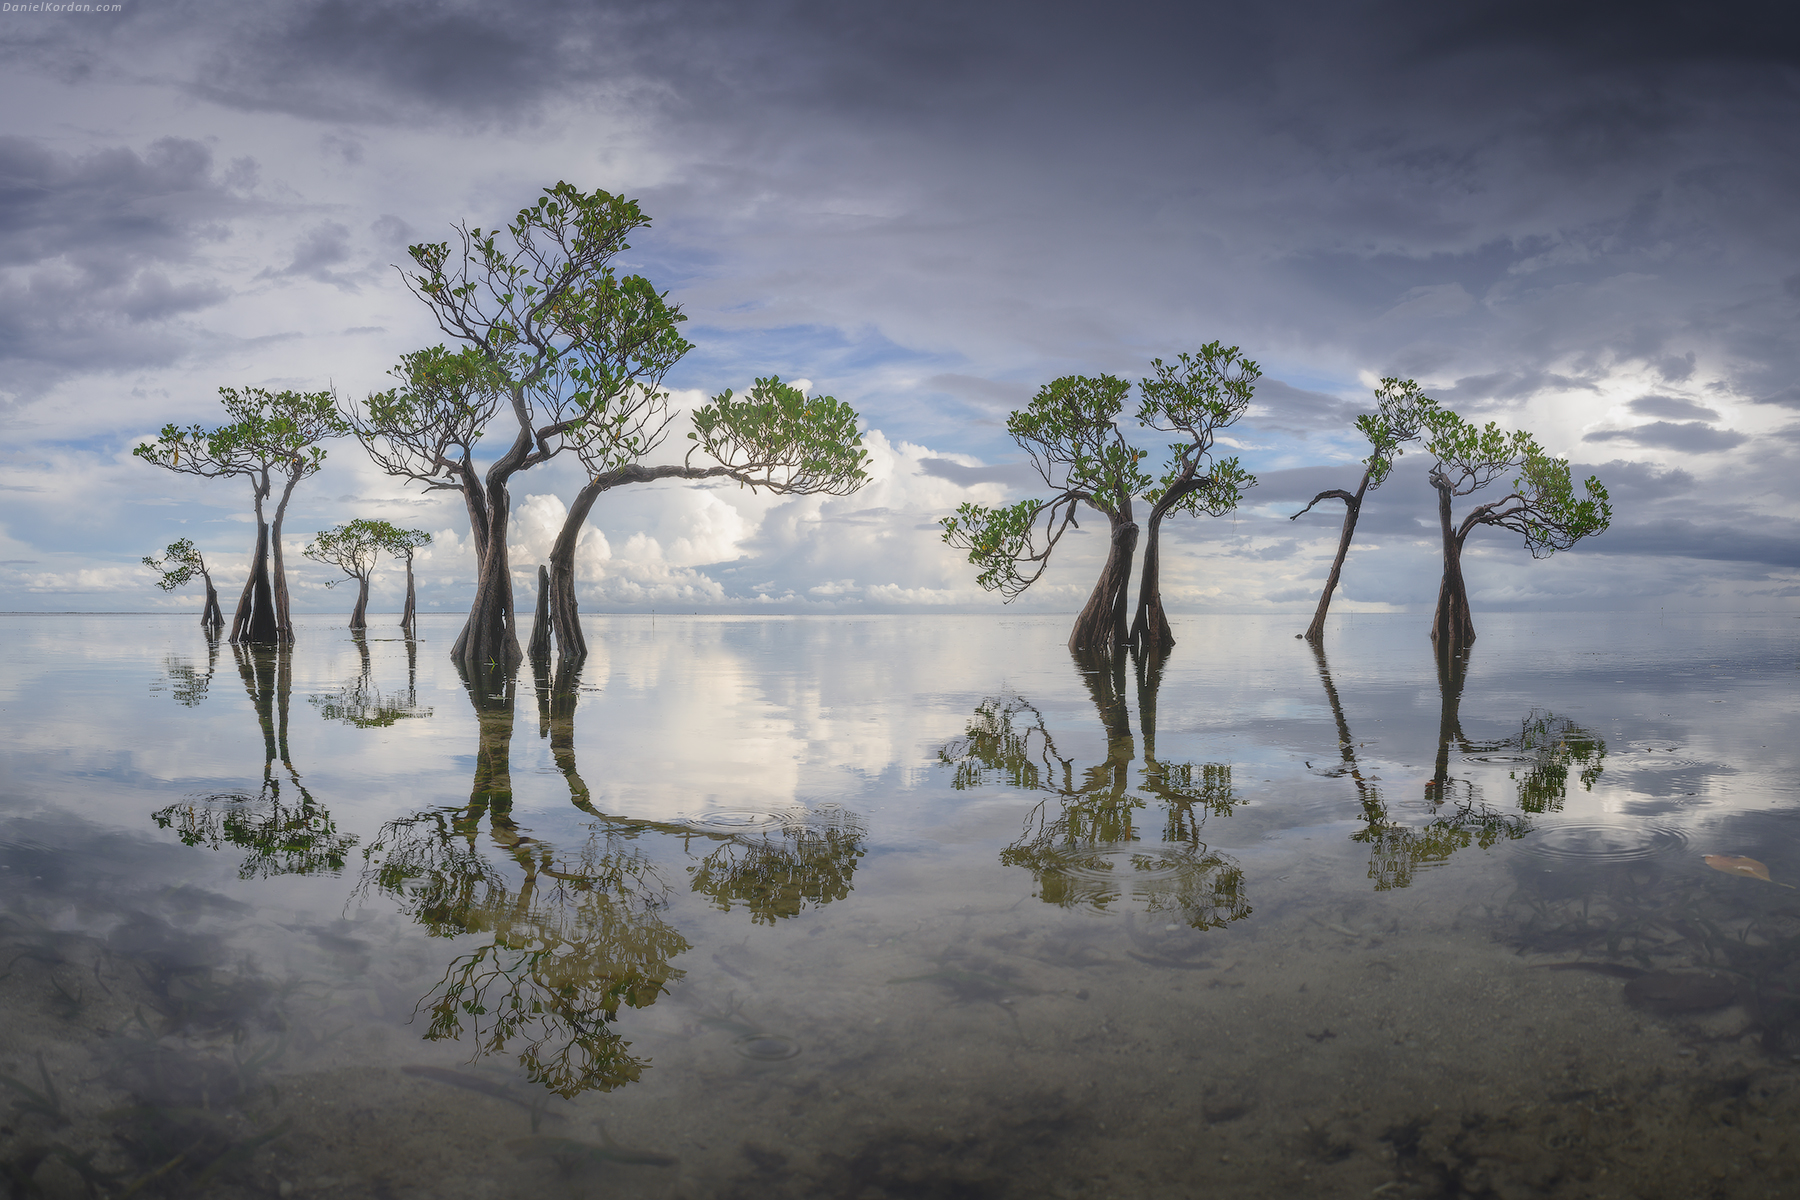 Sumba dancing trees, Indonesia